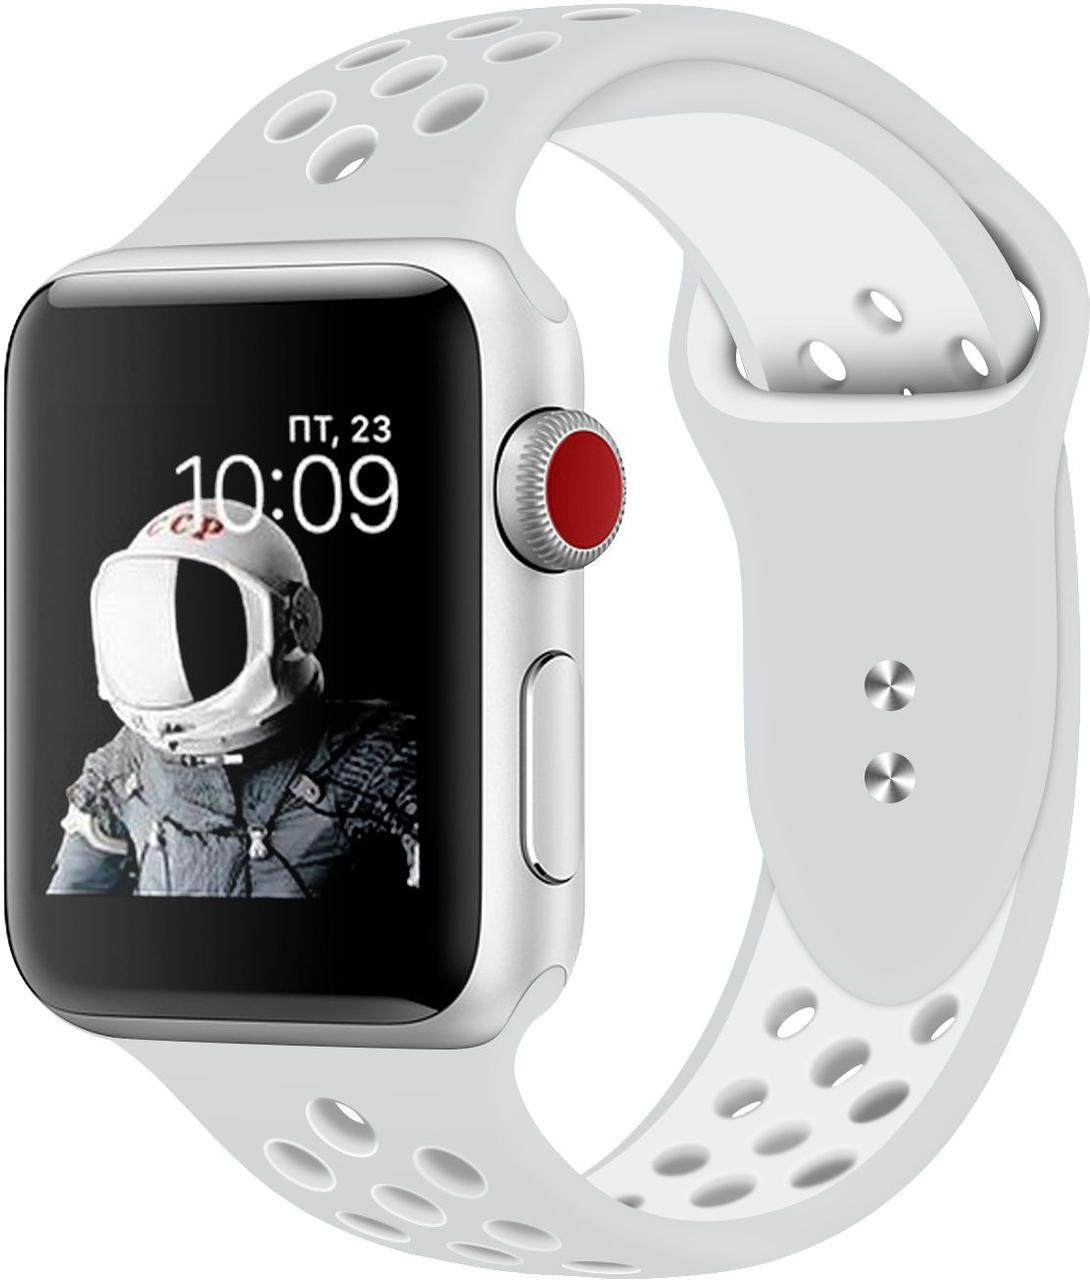 Силиконовый ремешок Promate Oreo-38ML для Apple Watch 38-40 мм Grey/White